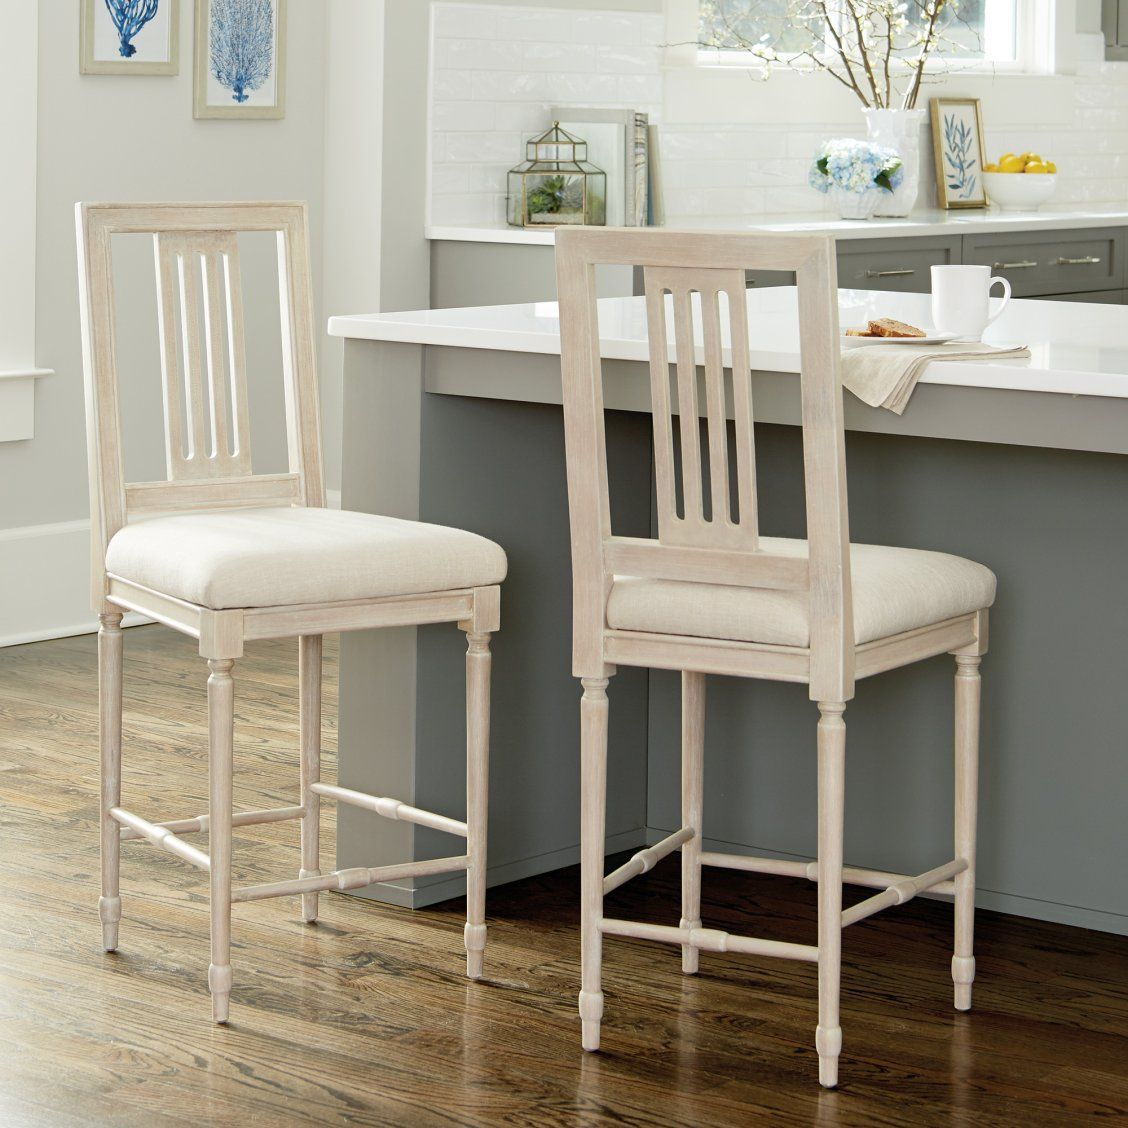 Tuva Slat Back Counter stool / Counter Reupholsterstool